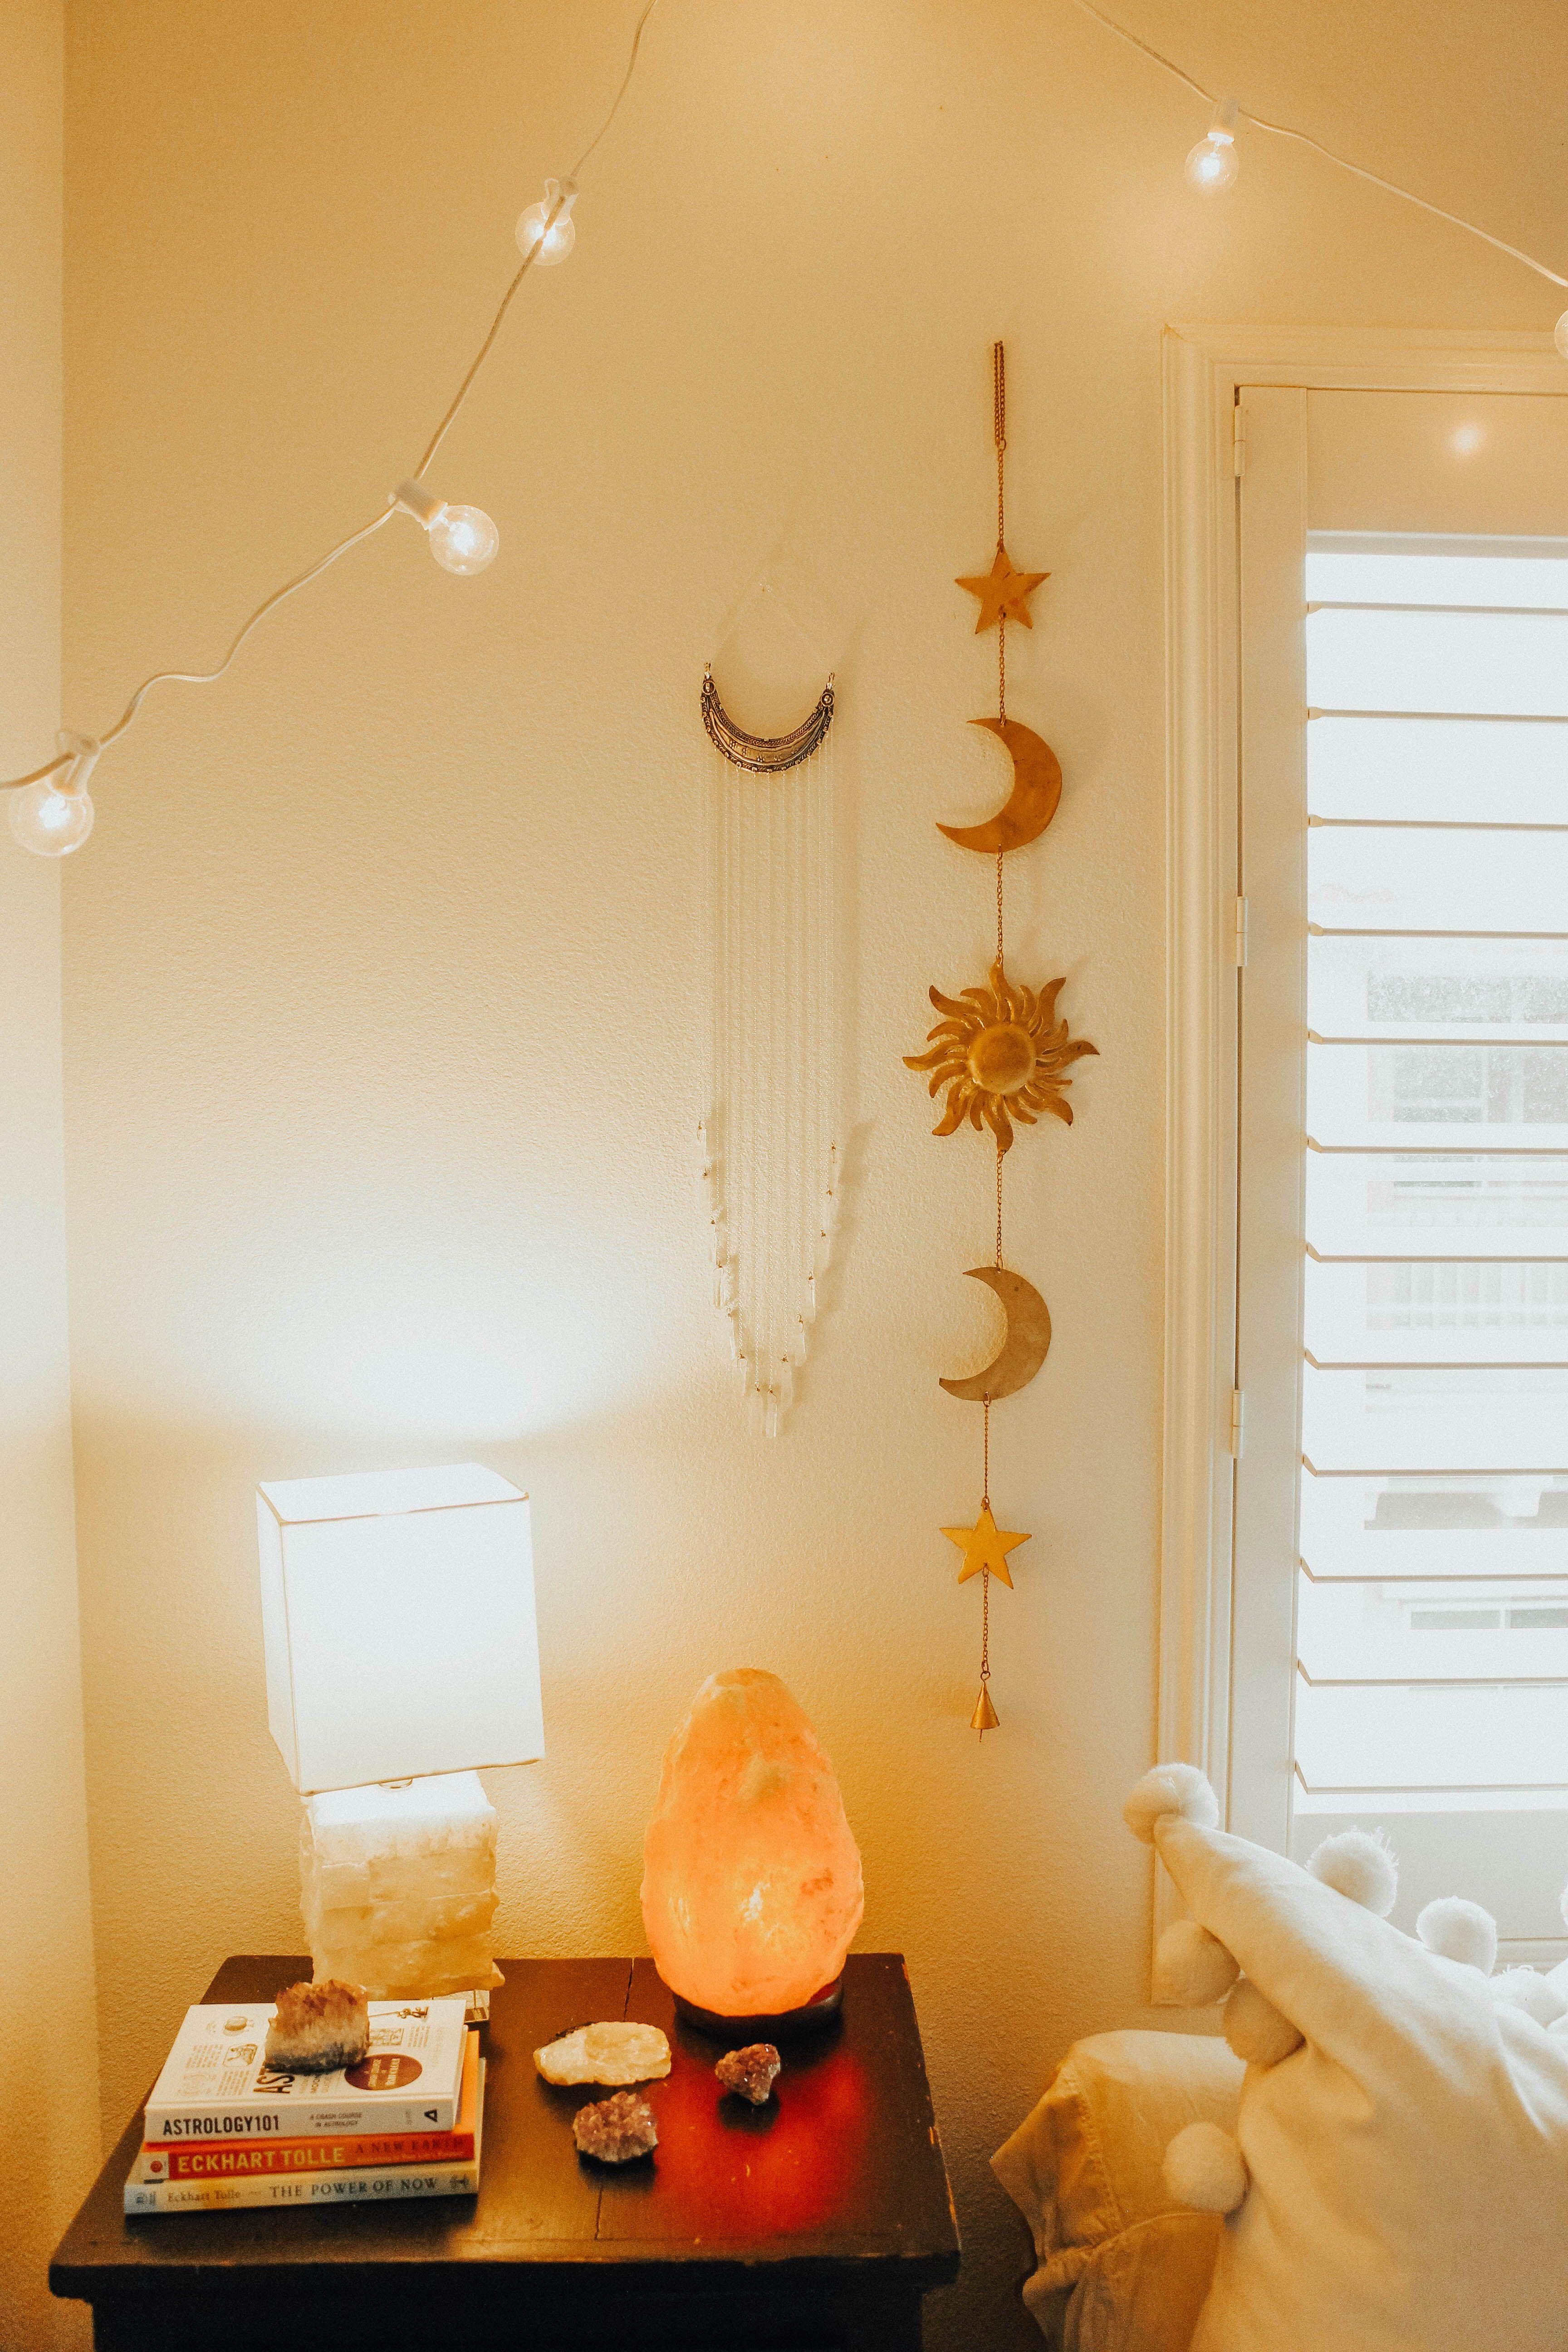 Celestial Sun and Moon Wall Hanging Decor   shop   Lady Scorpio ...